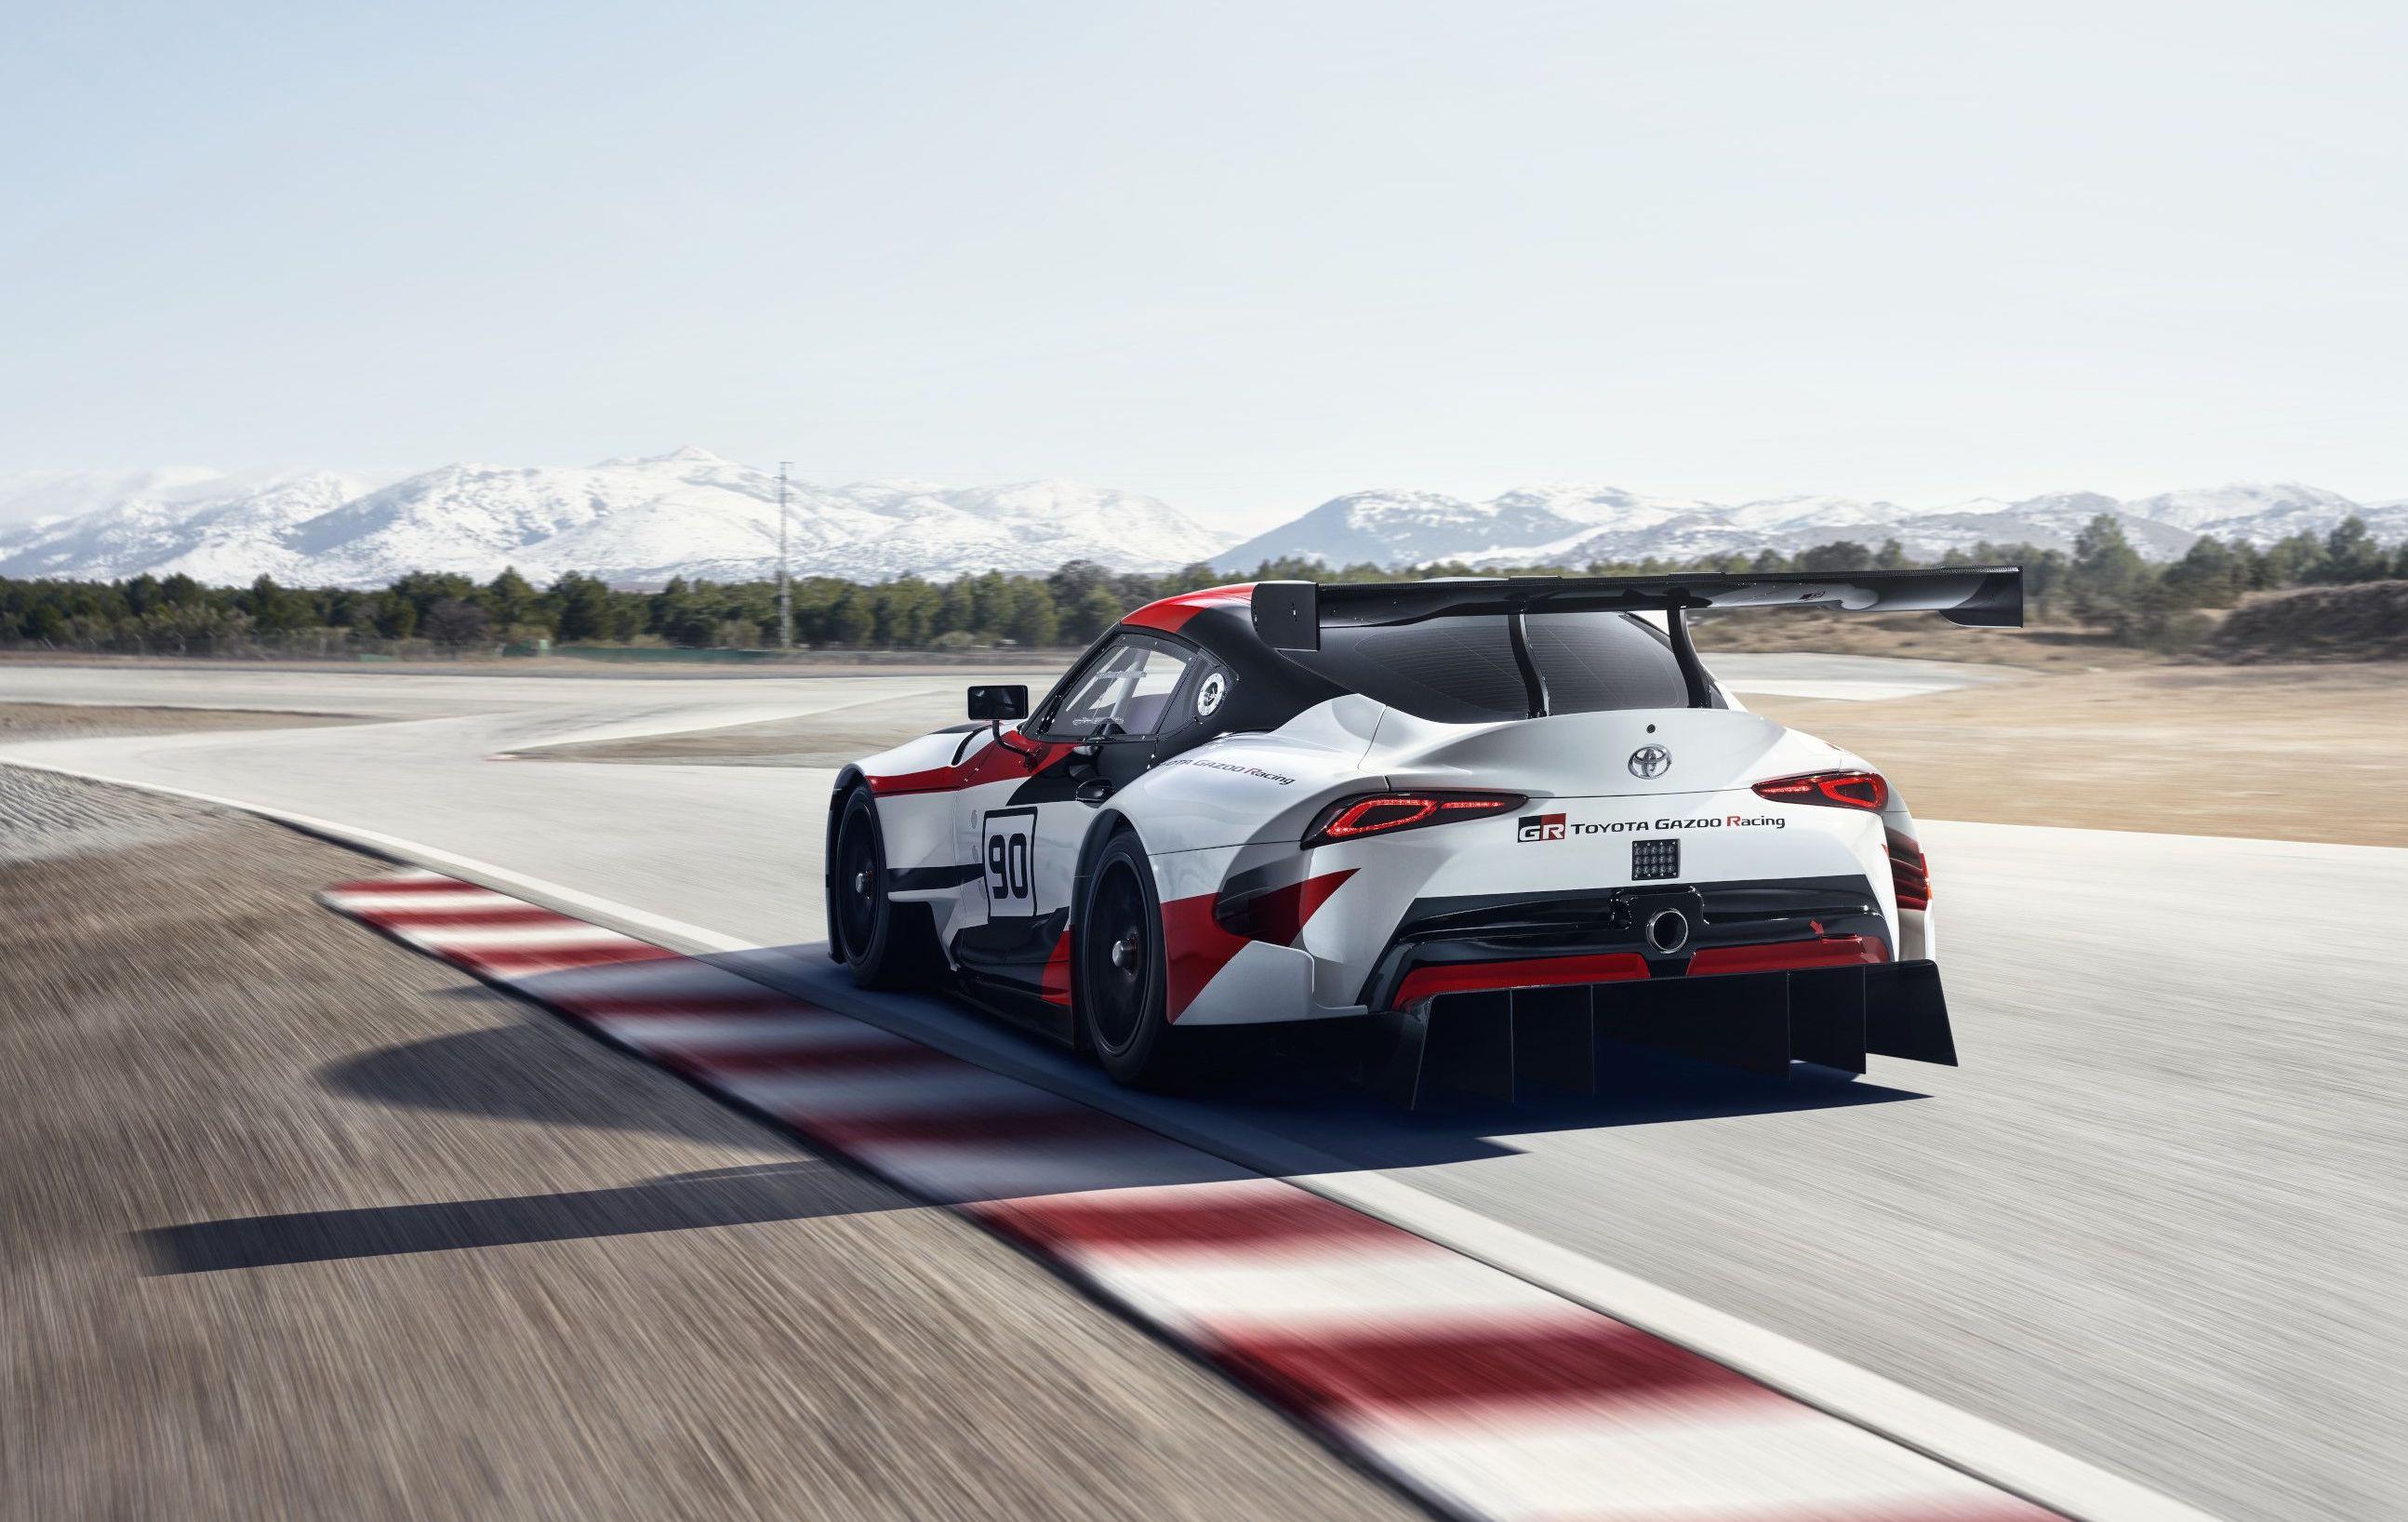 Toyota MkV Supra Concept